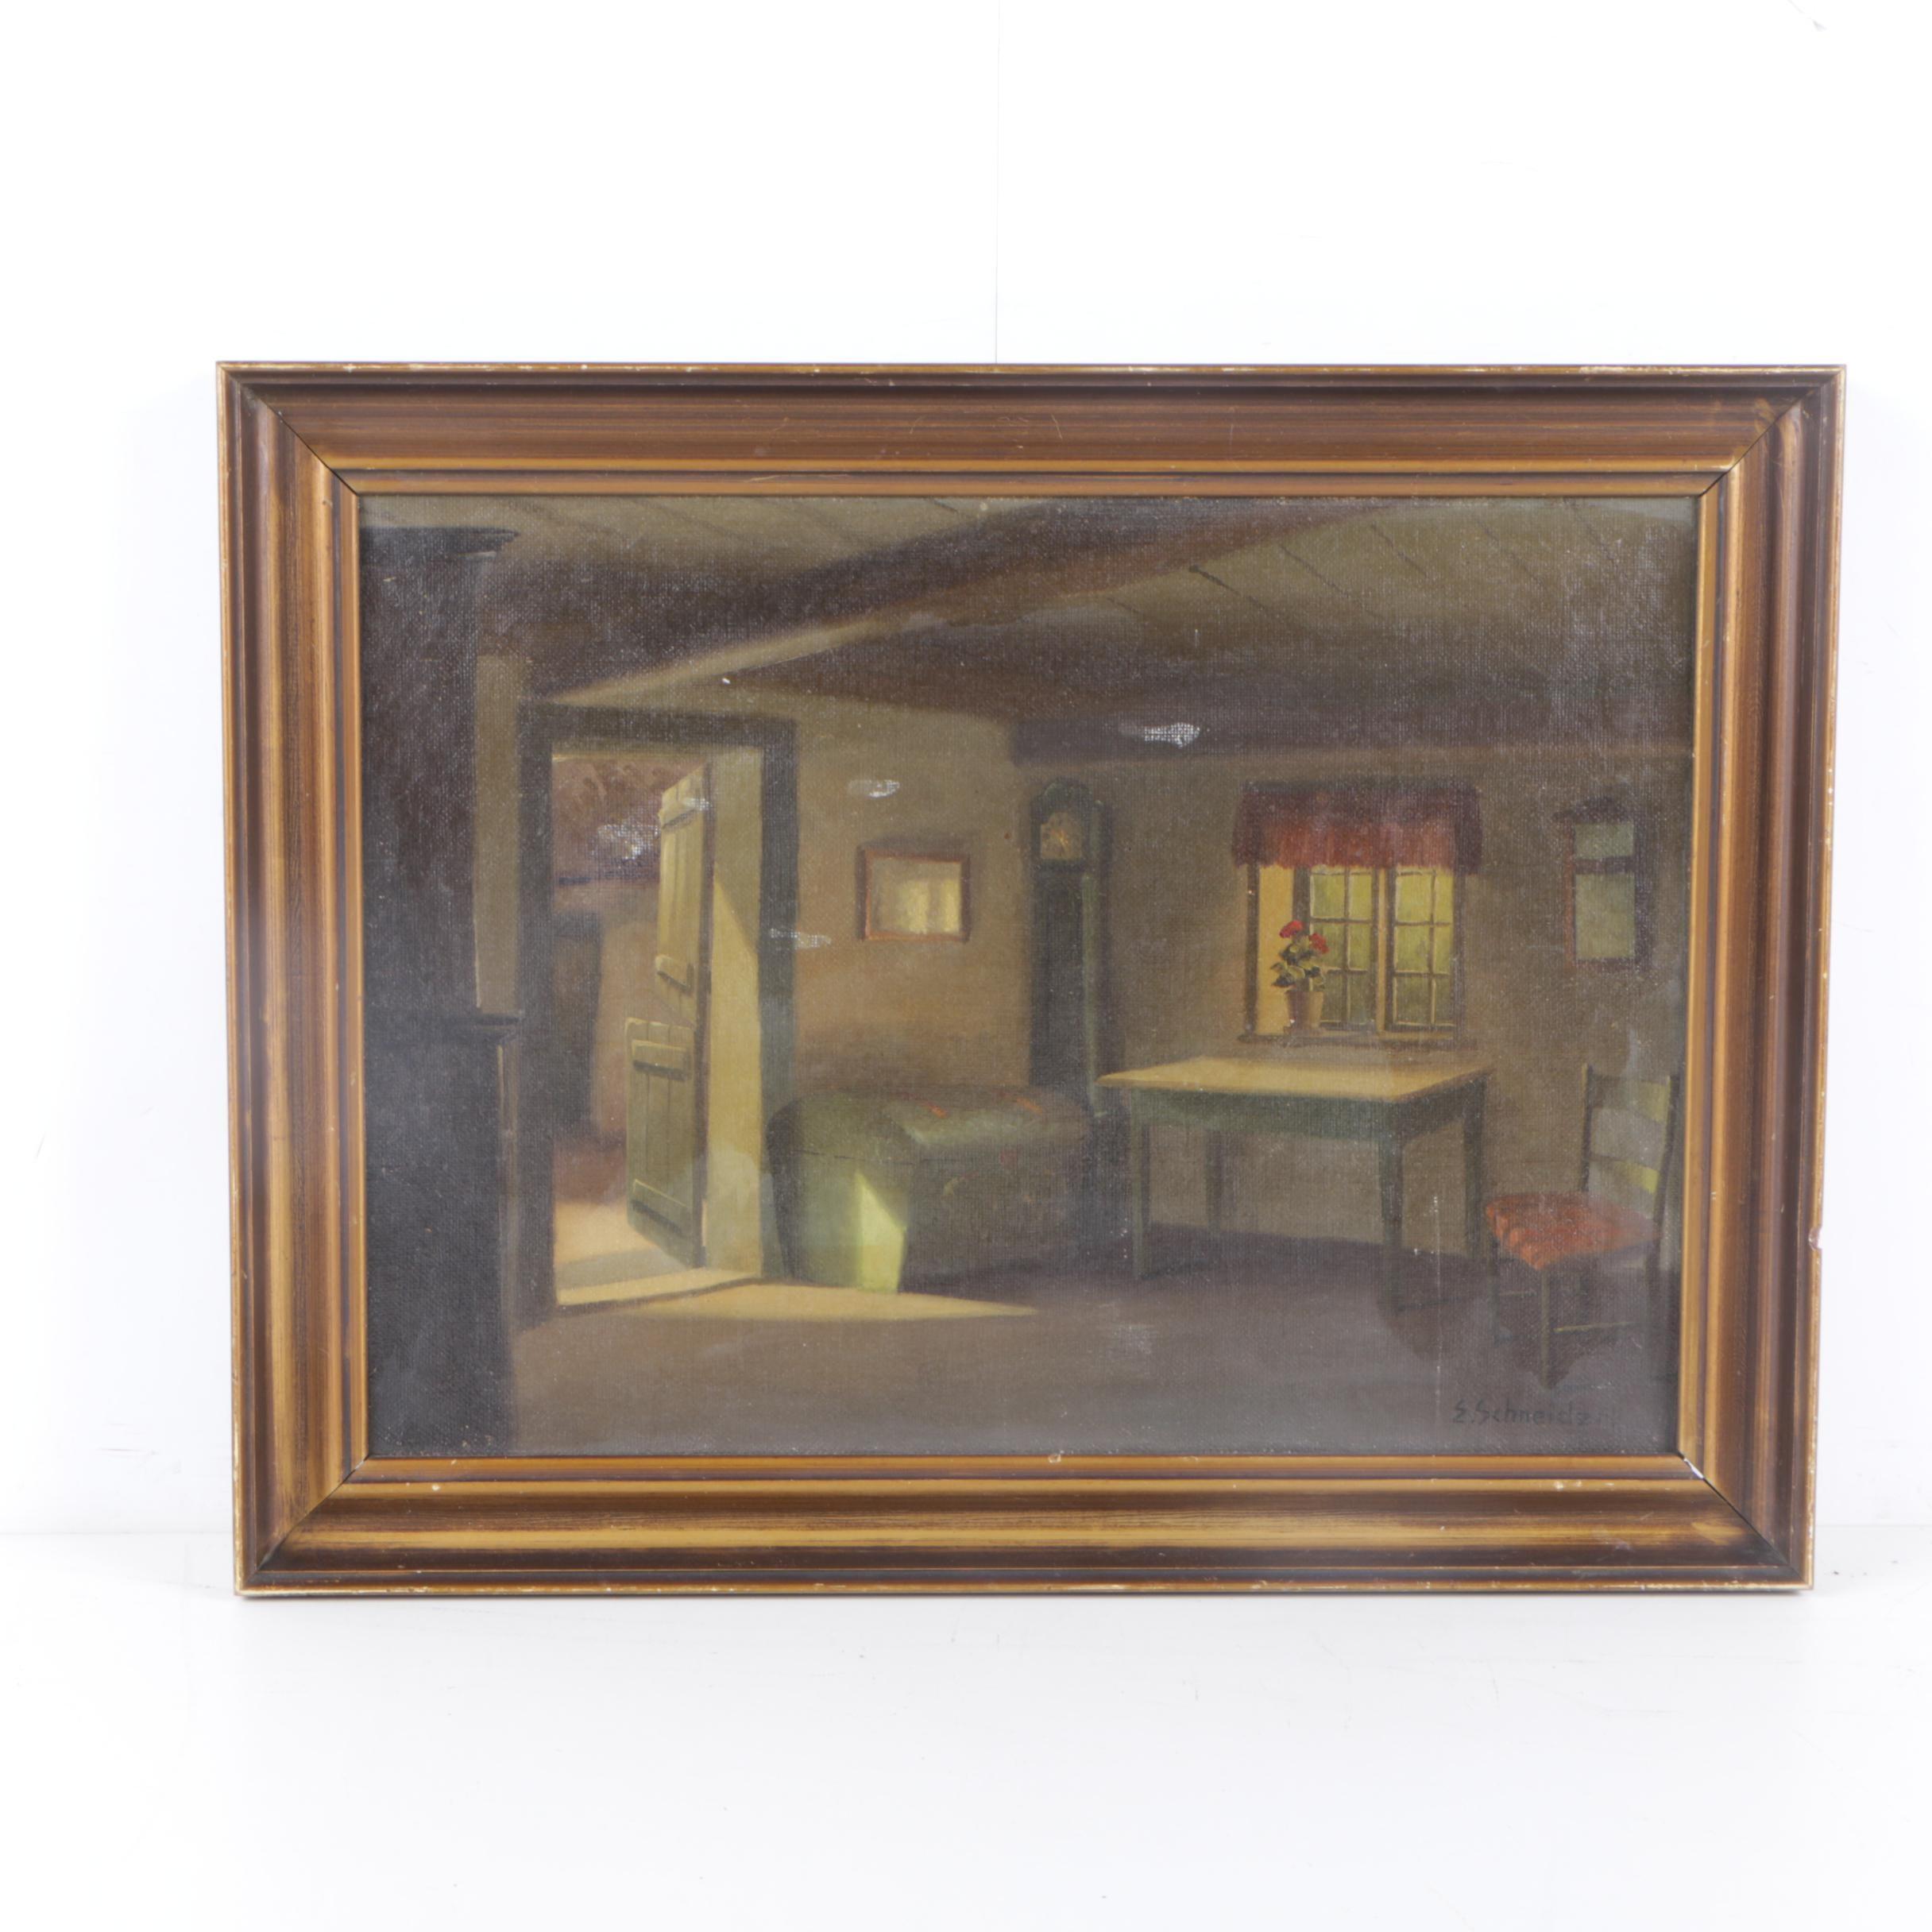 Emil Philippe Auguste Schneider Oil Painting of an Interior Scene